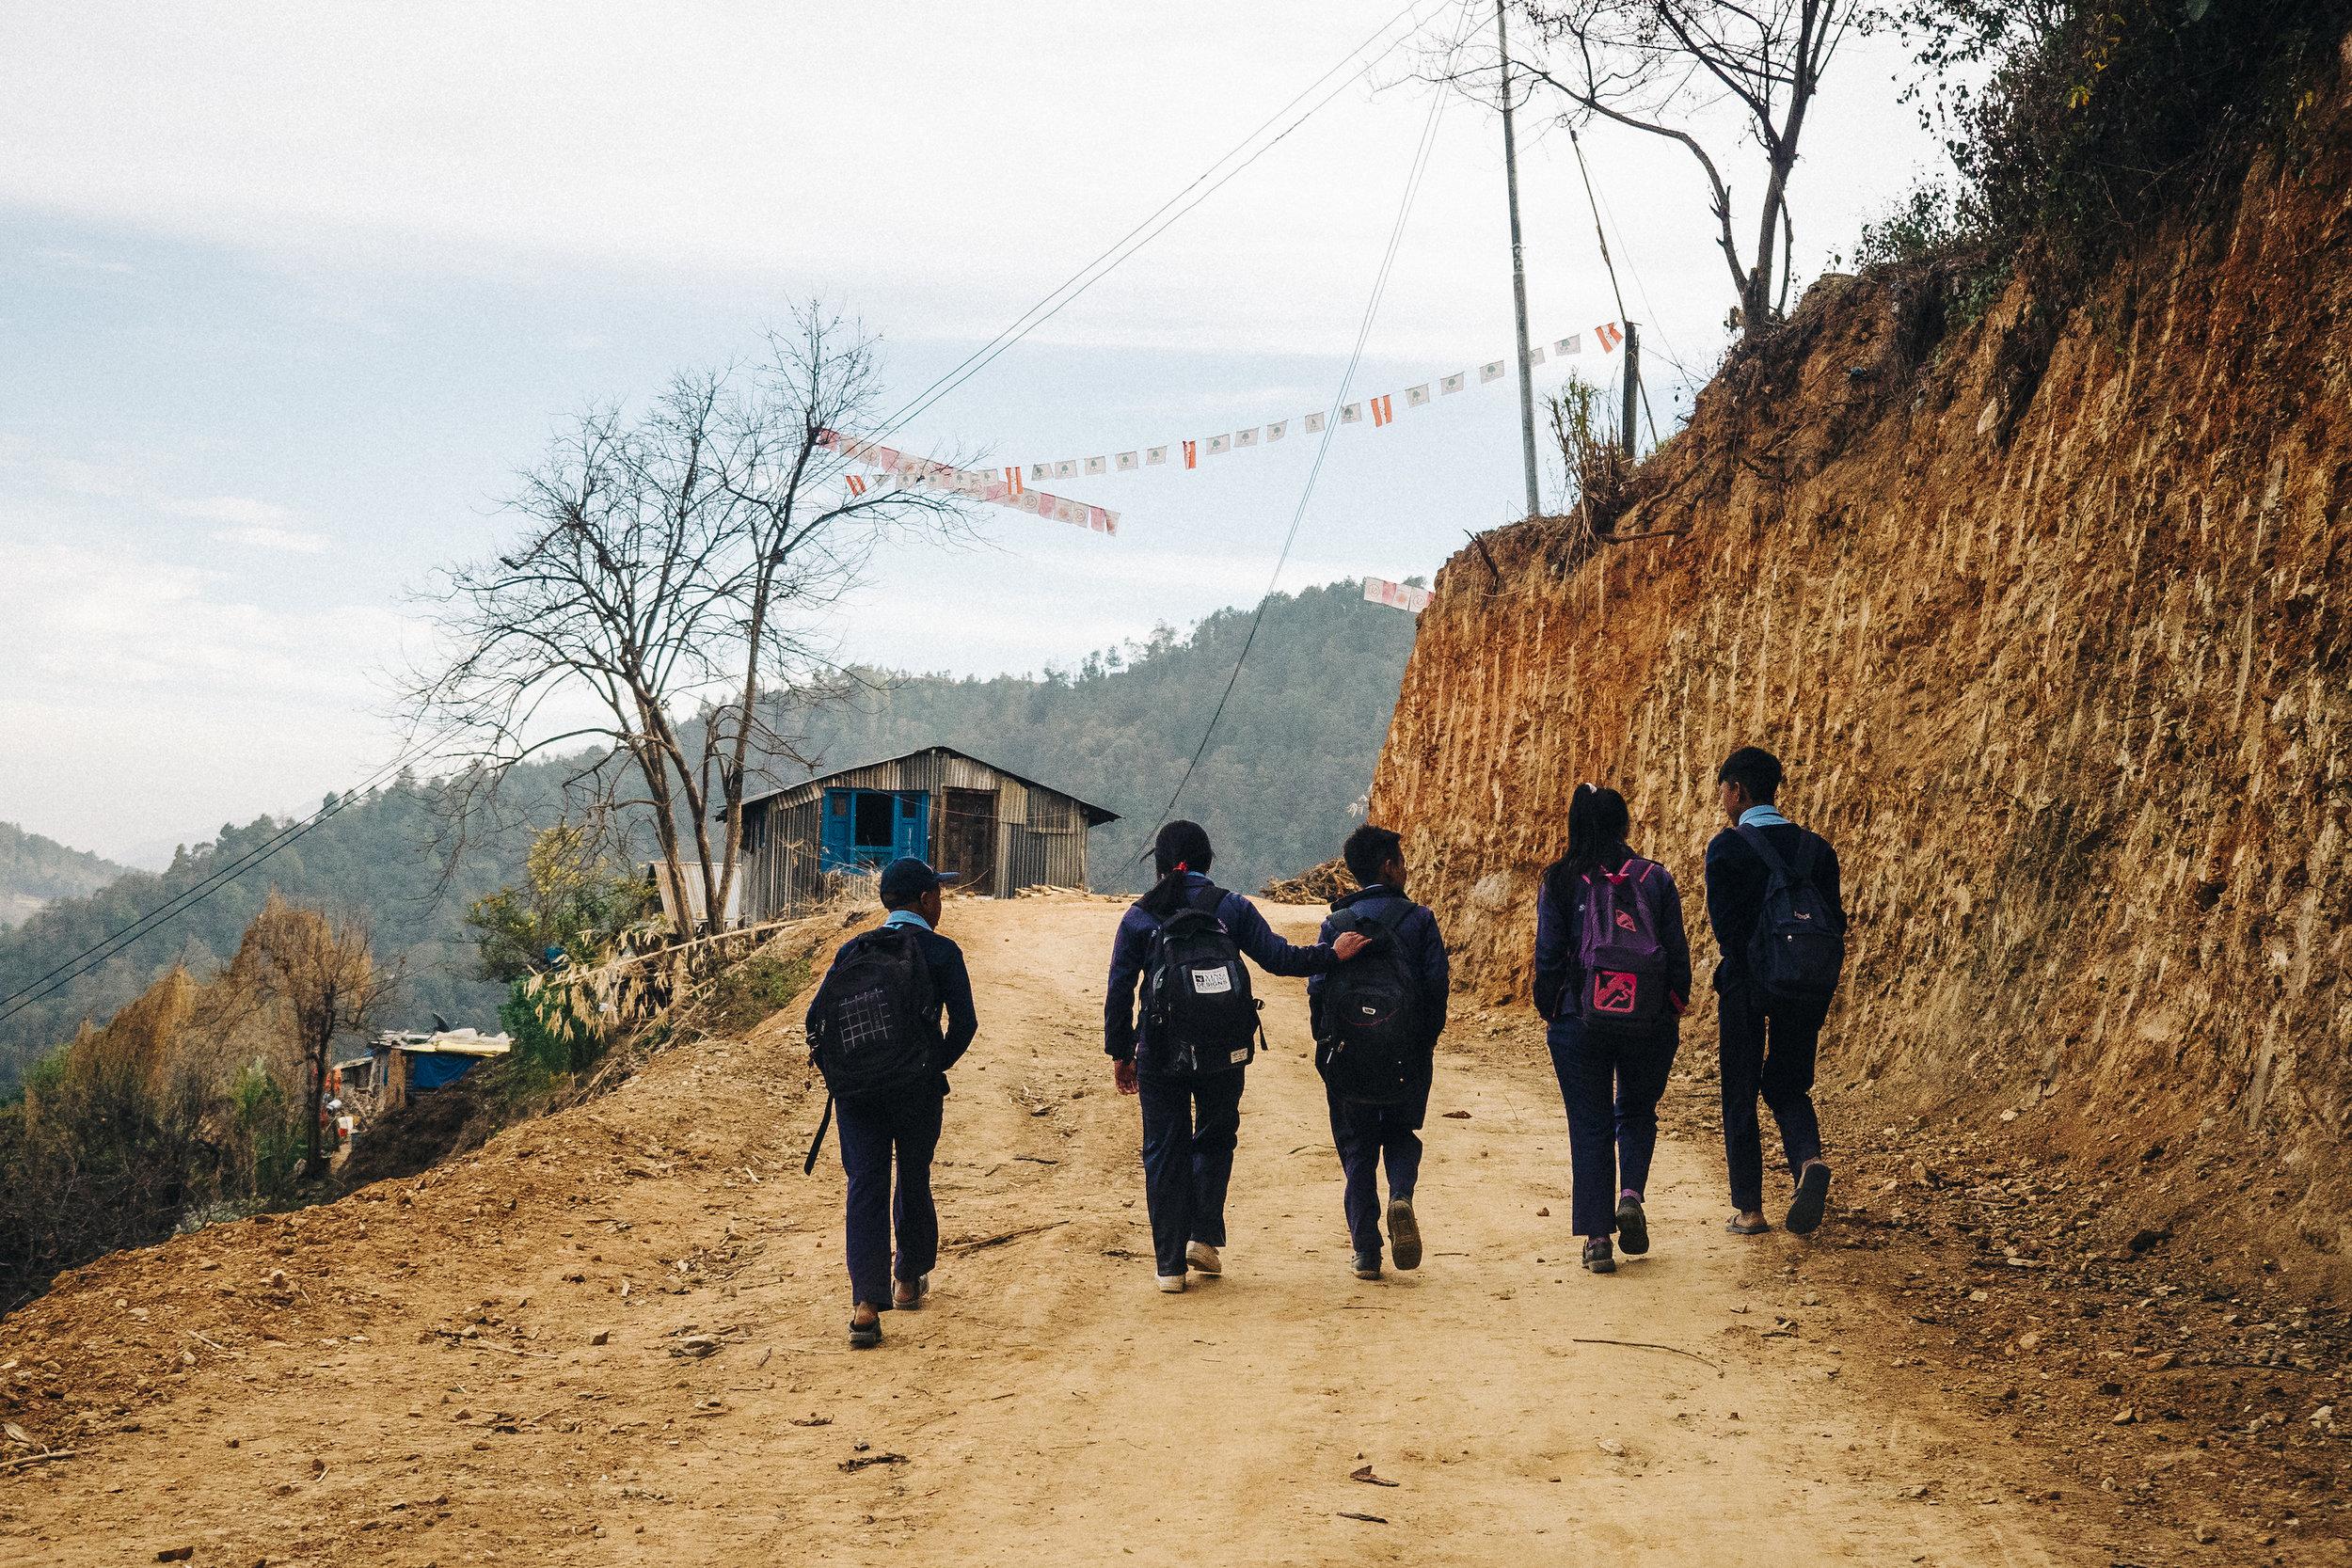 Bhaktapur, Nepal - 2018